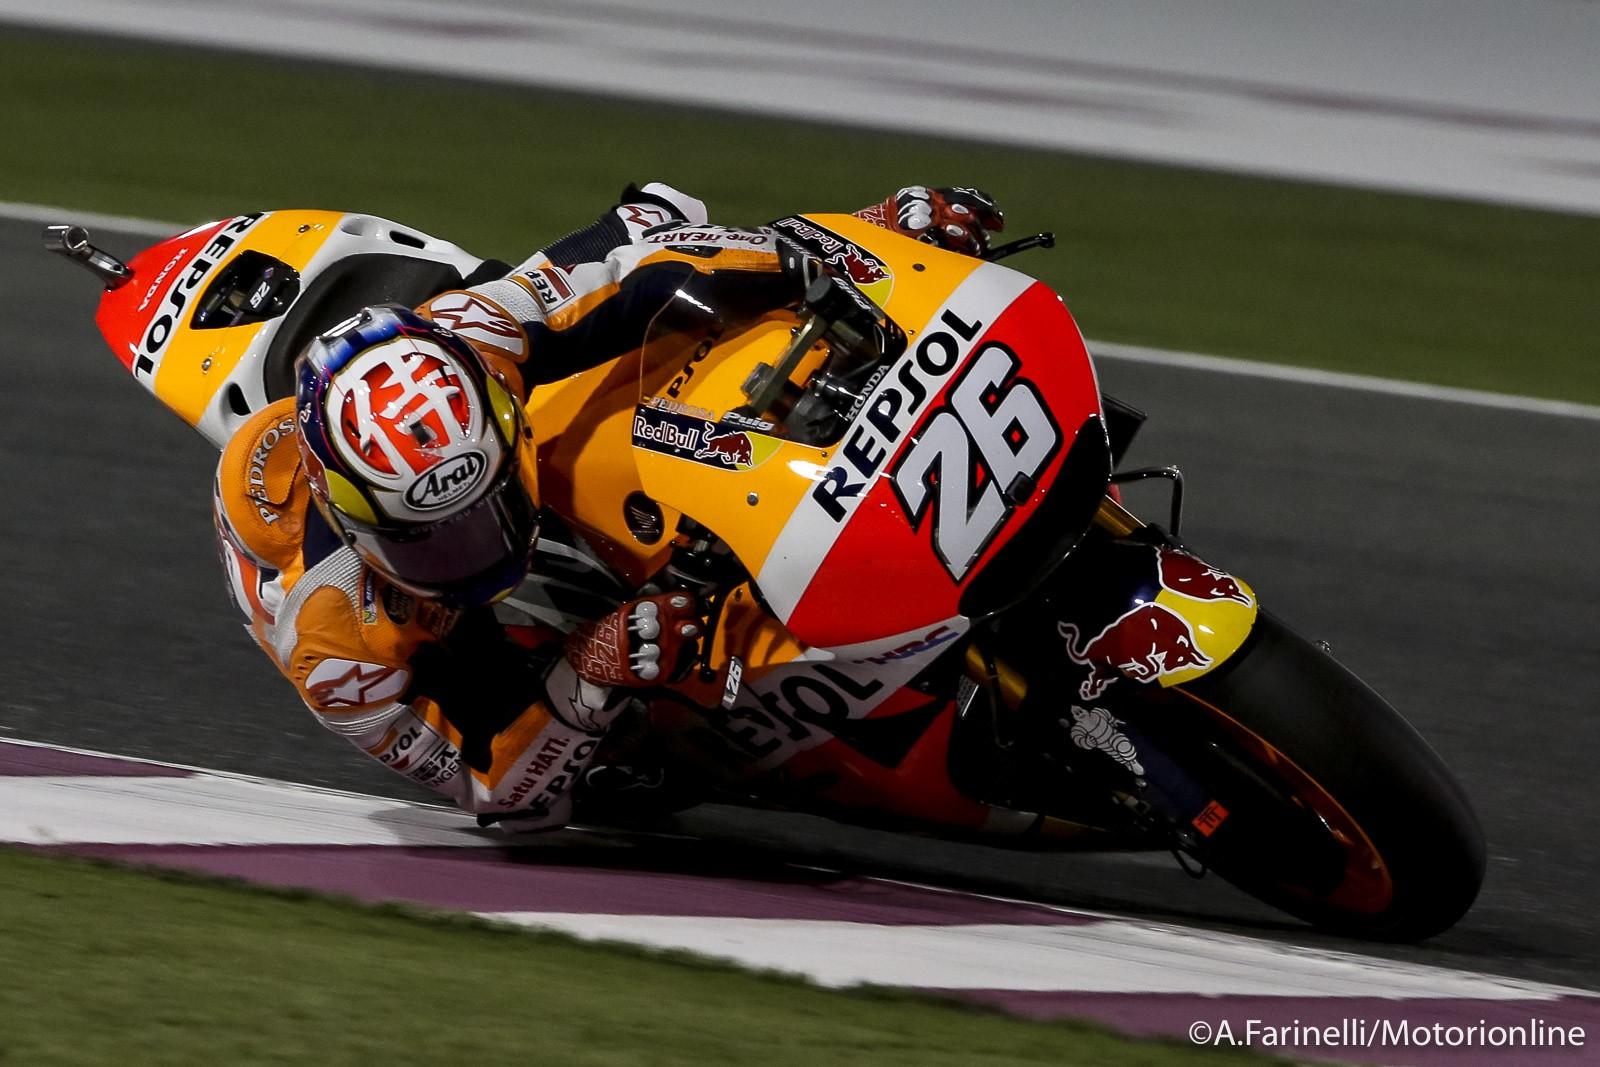 Motogp Qatar Video | MotoGP 2017 Info, Video, Points Table